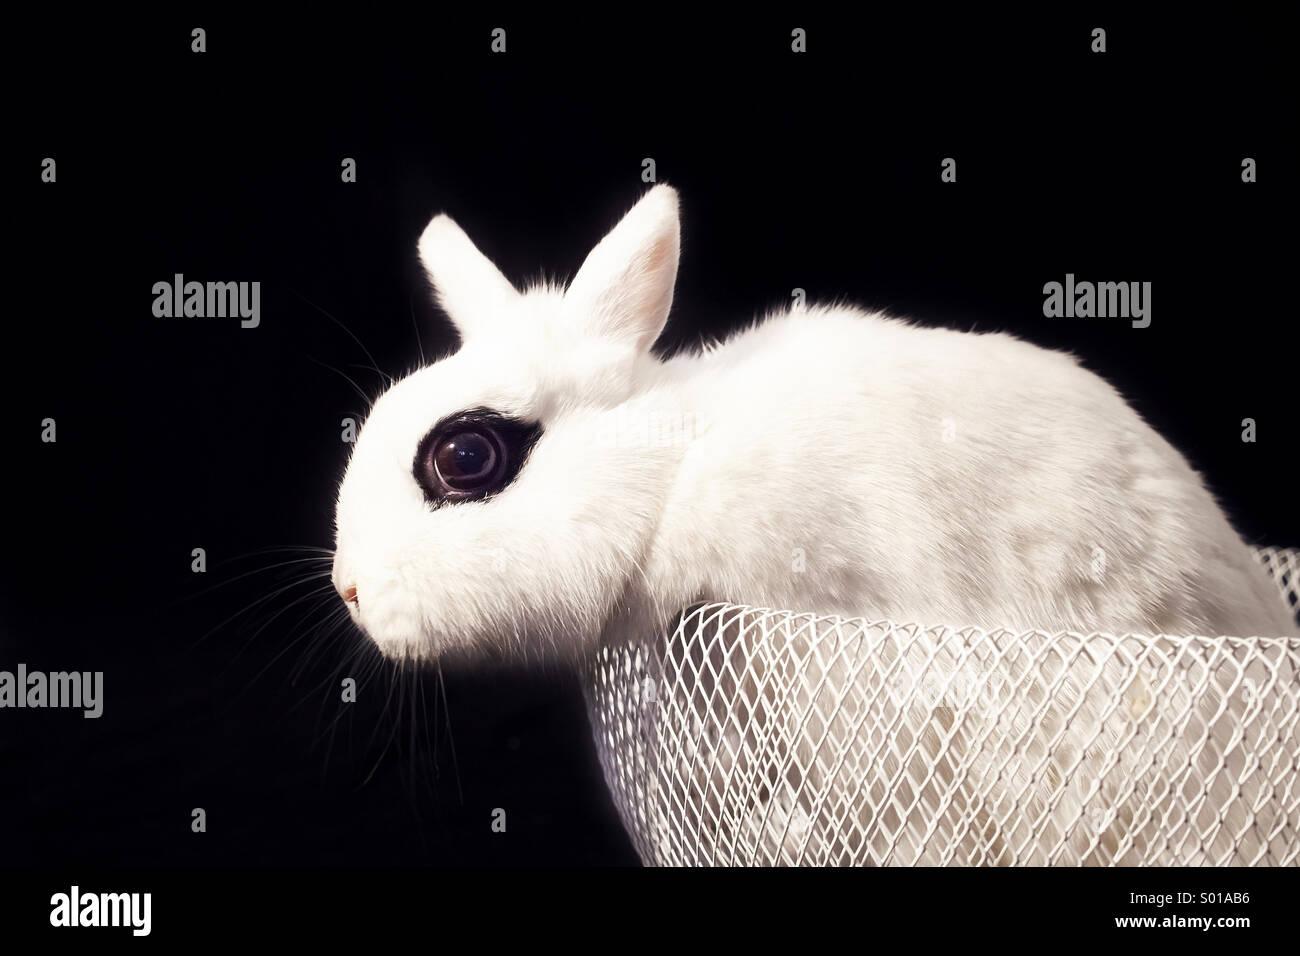 White rabbit in basket - Stock Image